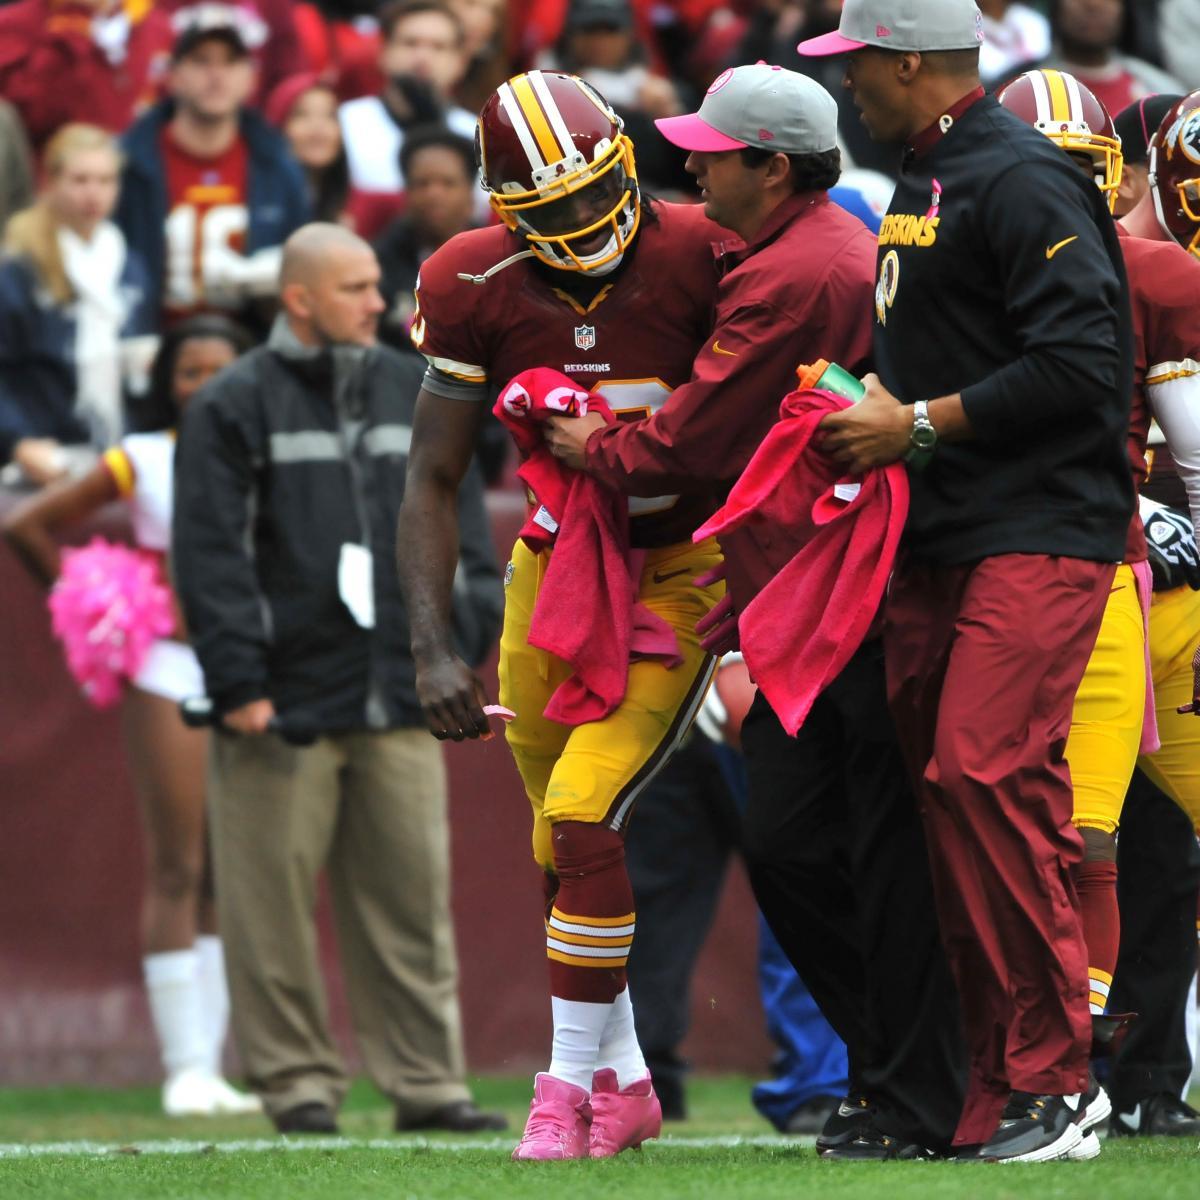 b34f7c20d2b8 NFL Week 6 Injury Report  Who Will Play